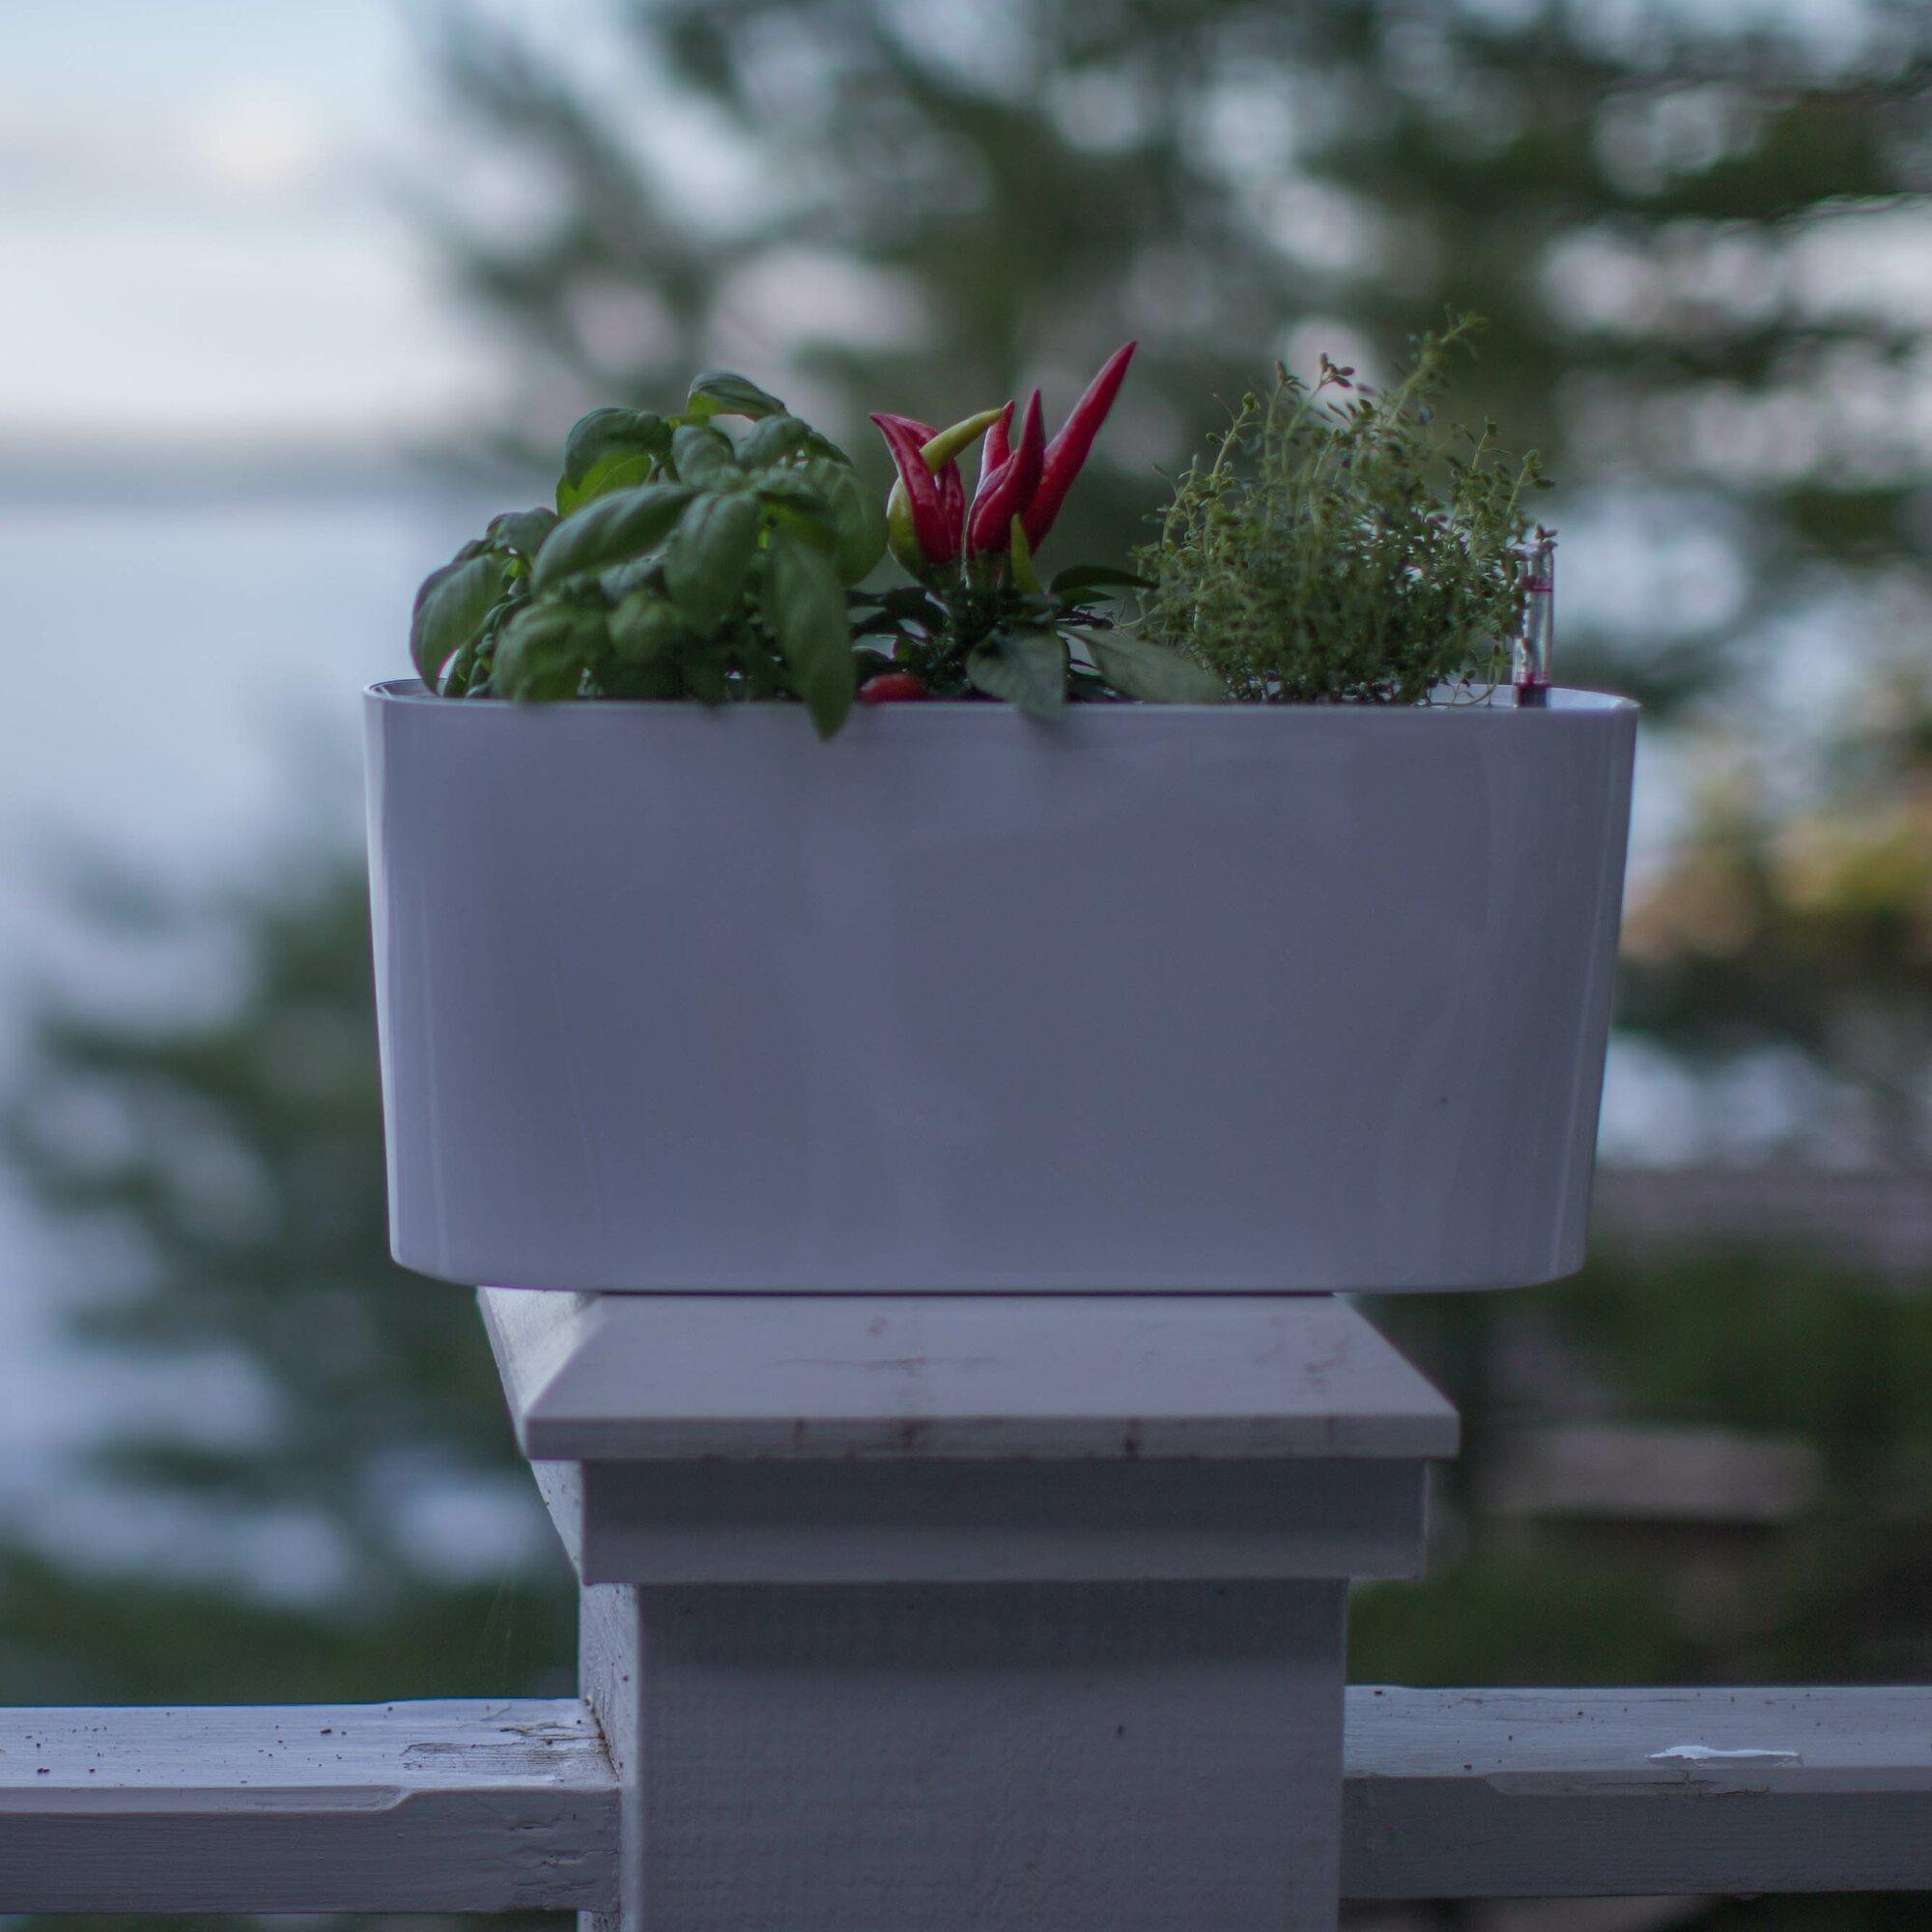 Algreen Modena Self Watering Plastic Planter Box Reviews